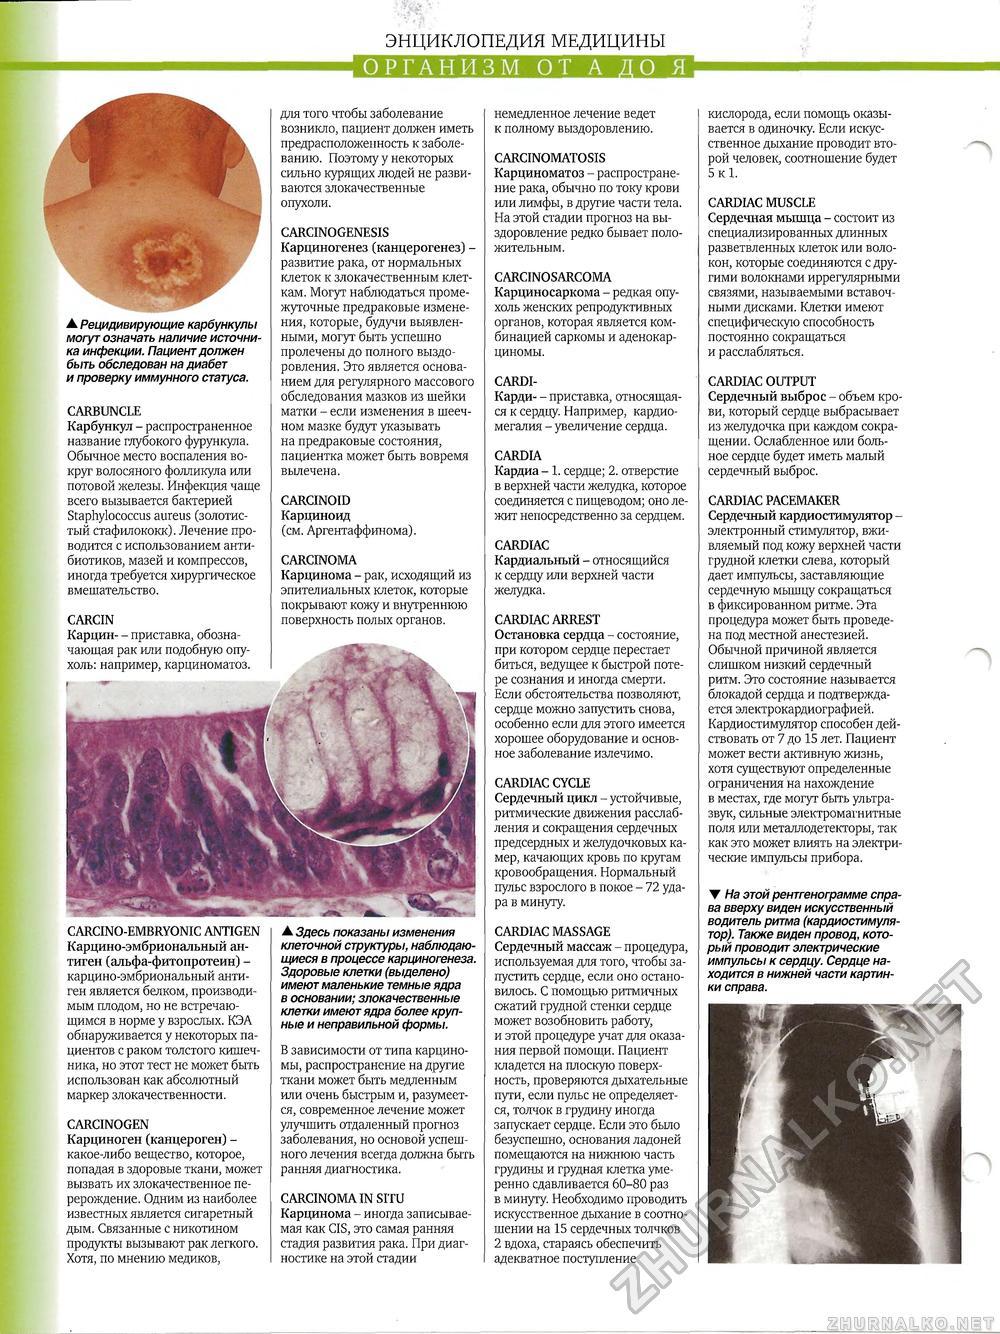 Карциногенез